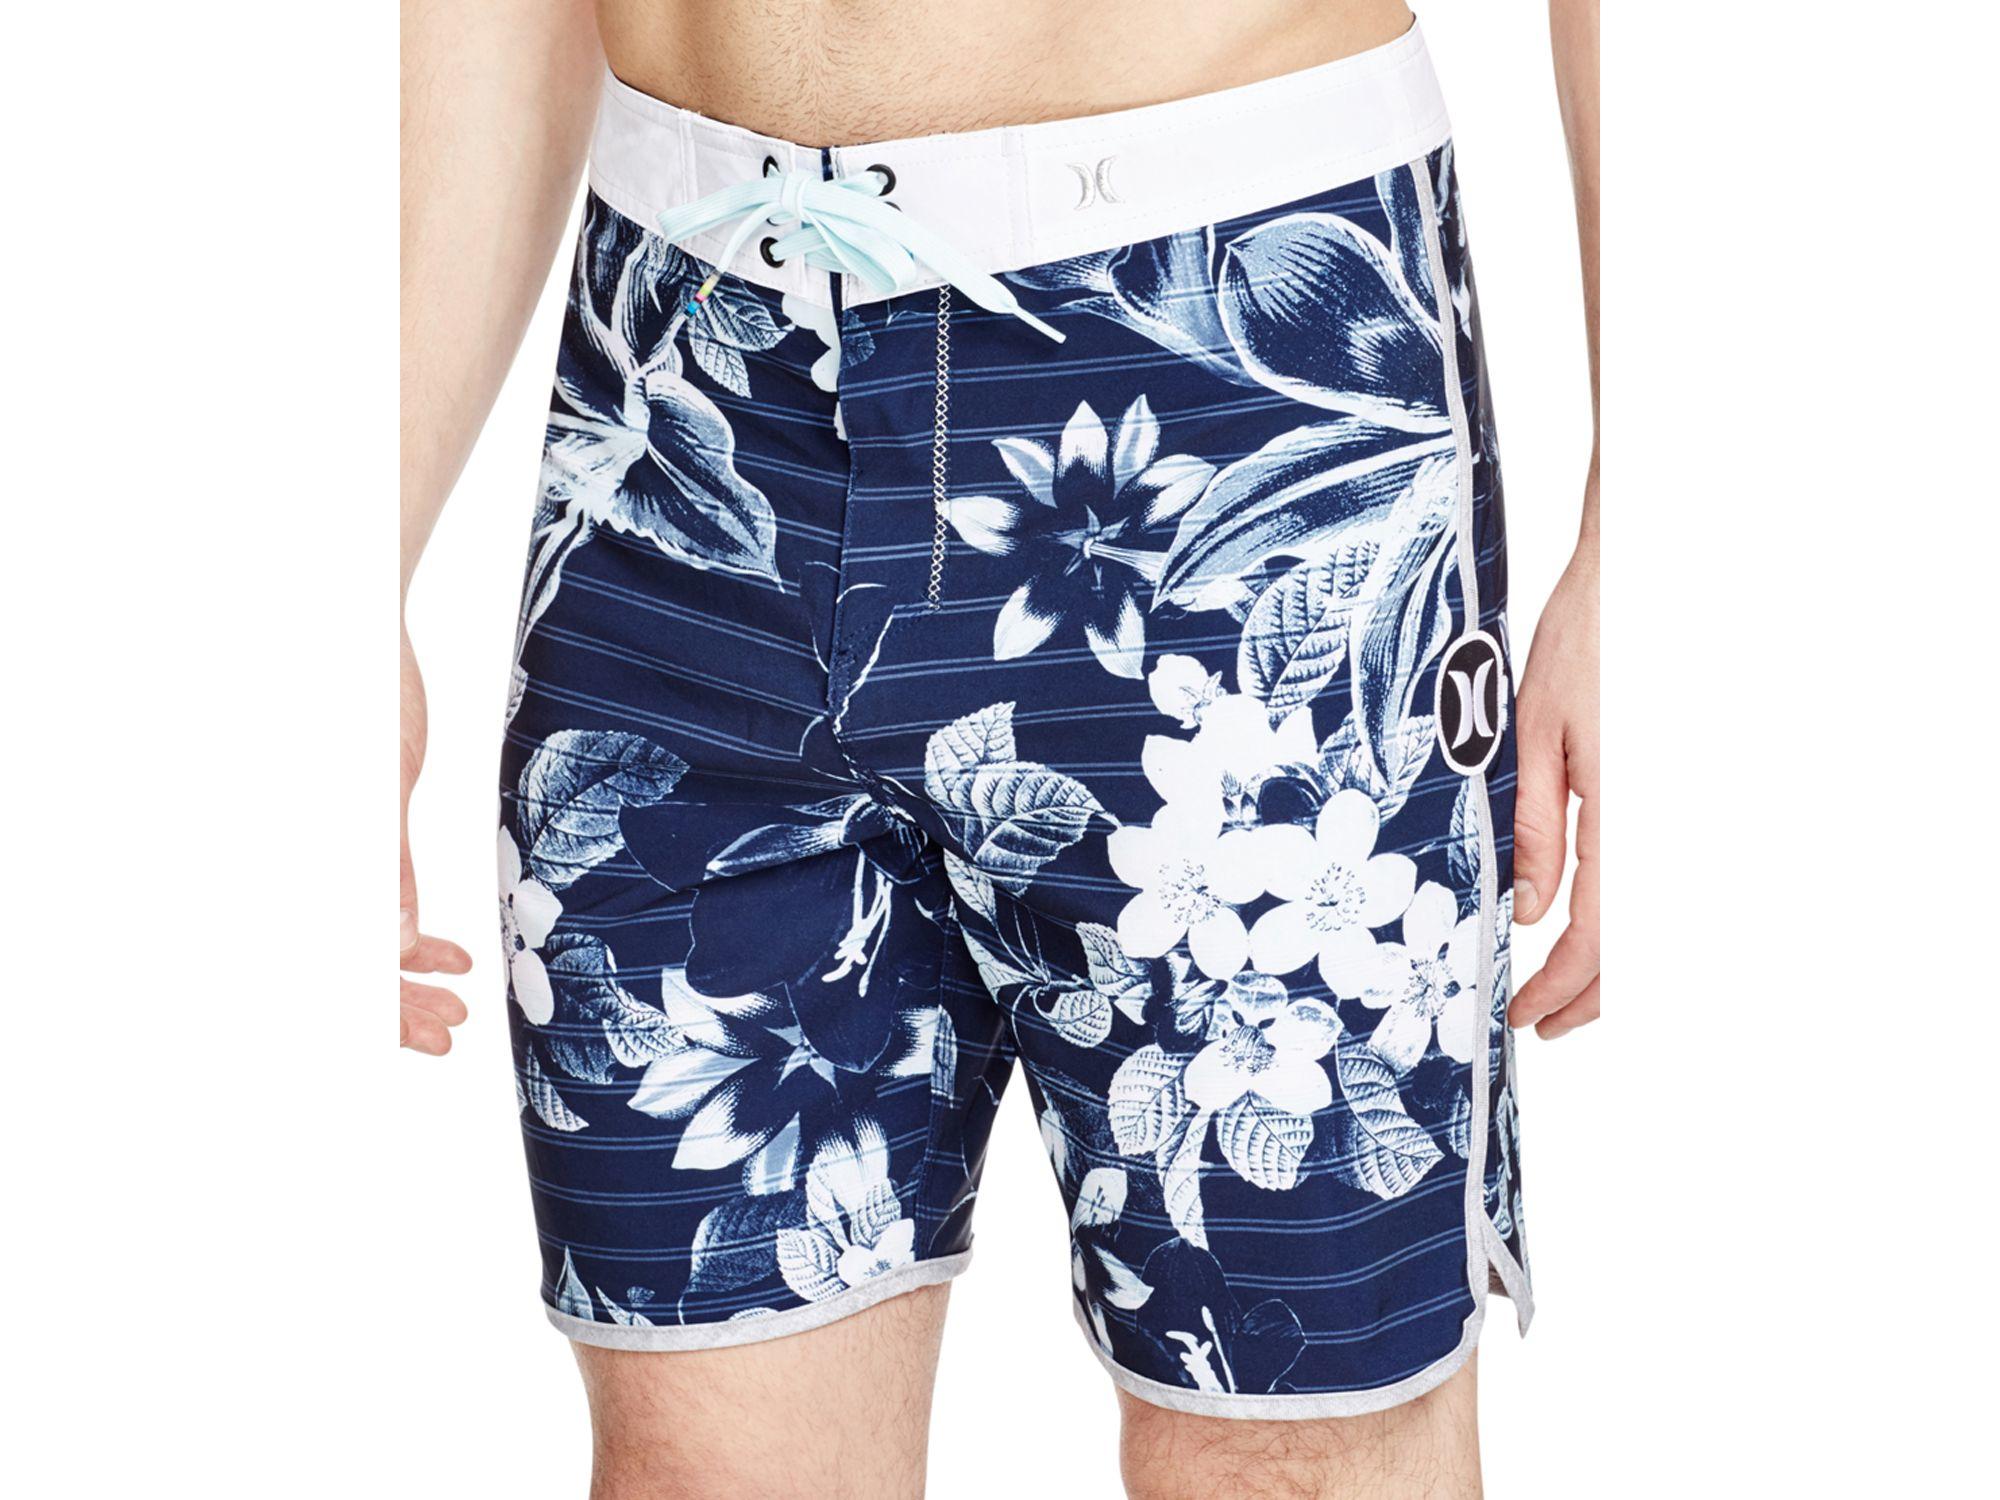 Lyst Hurley Phantom Lark Floral Board Shorts In Blue For Men